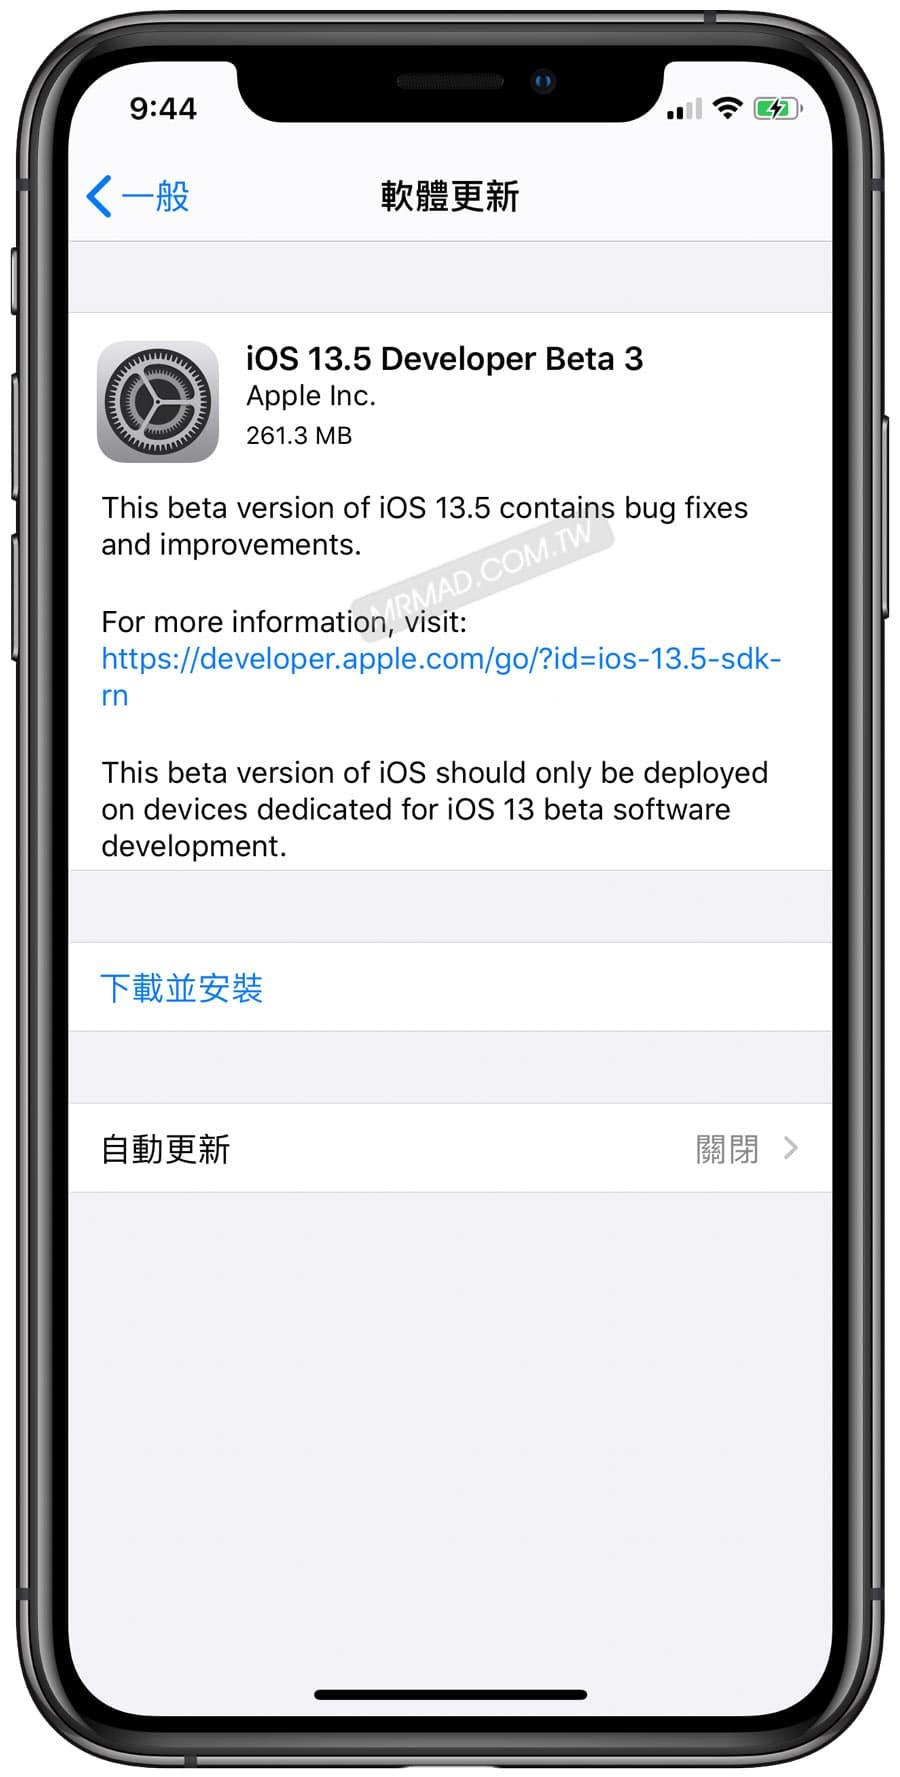 iOS 13.5-developer-beta3